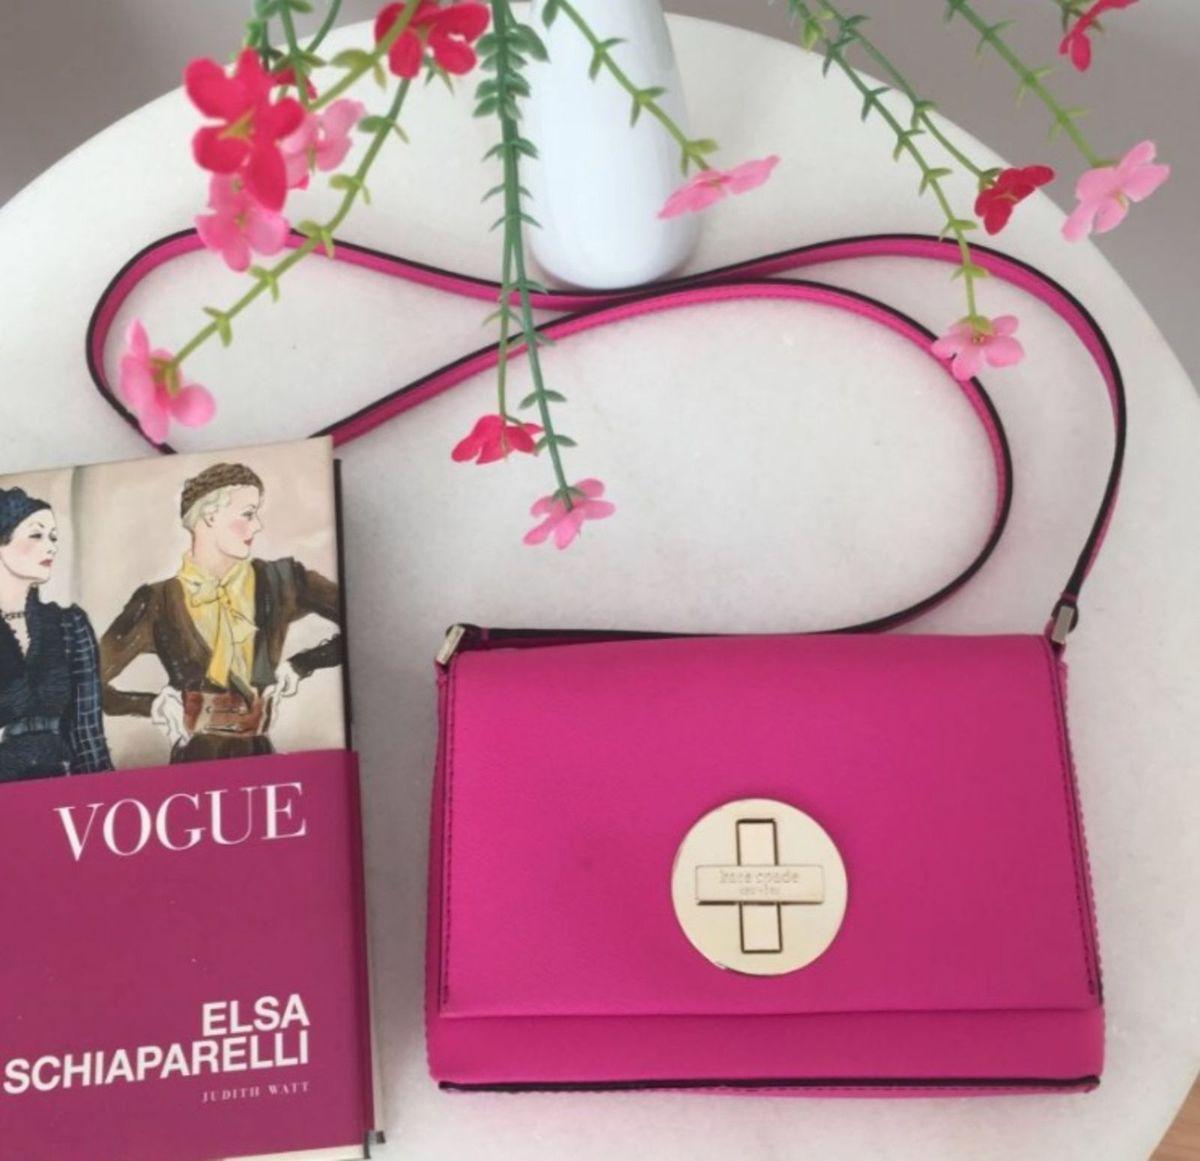 pink spade- linda bolsa kate spade rosa e dourada nova - bolsas kate-spade 4a689bf4181d